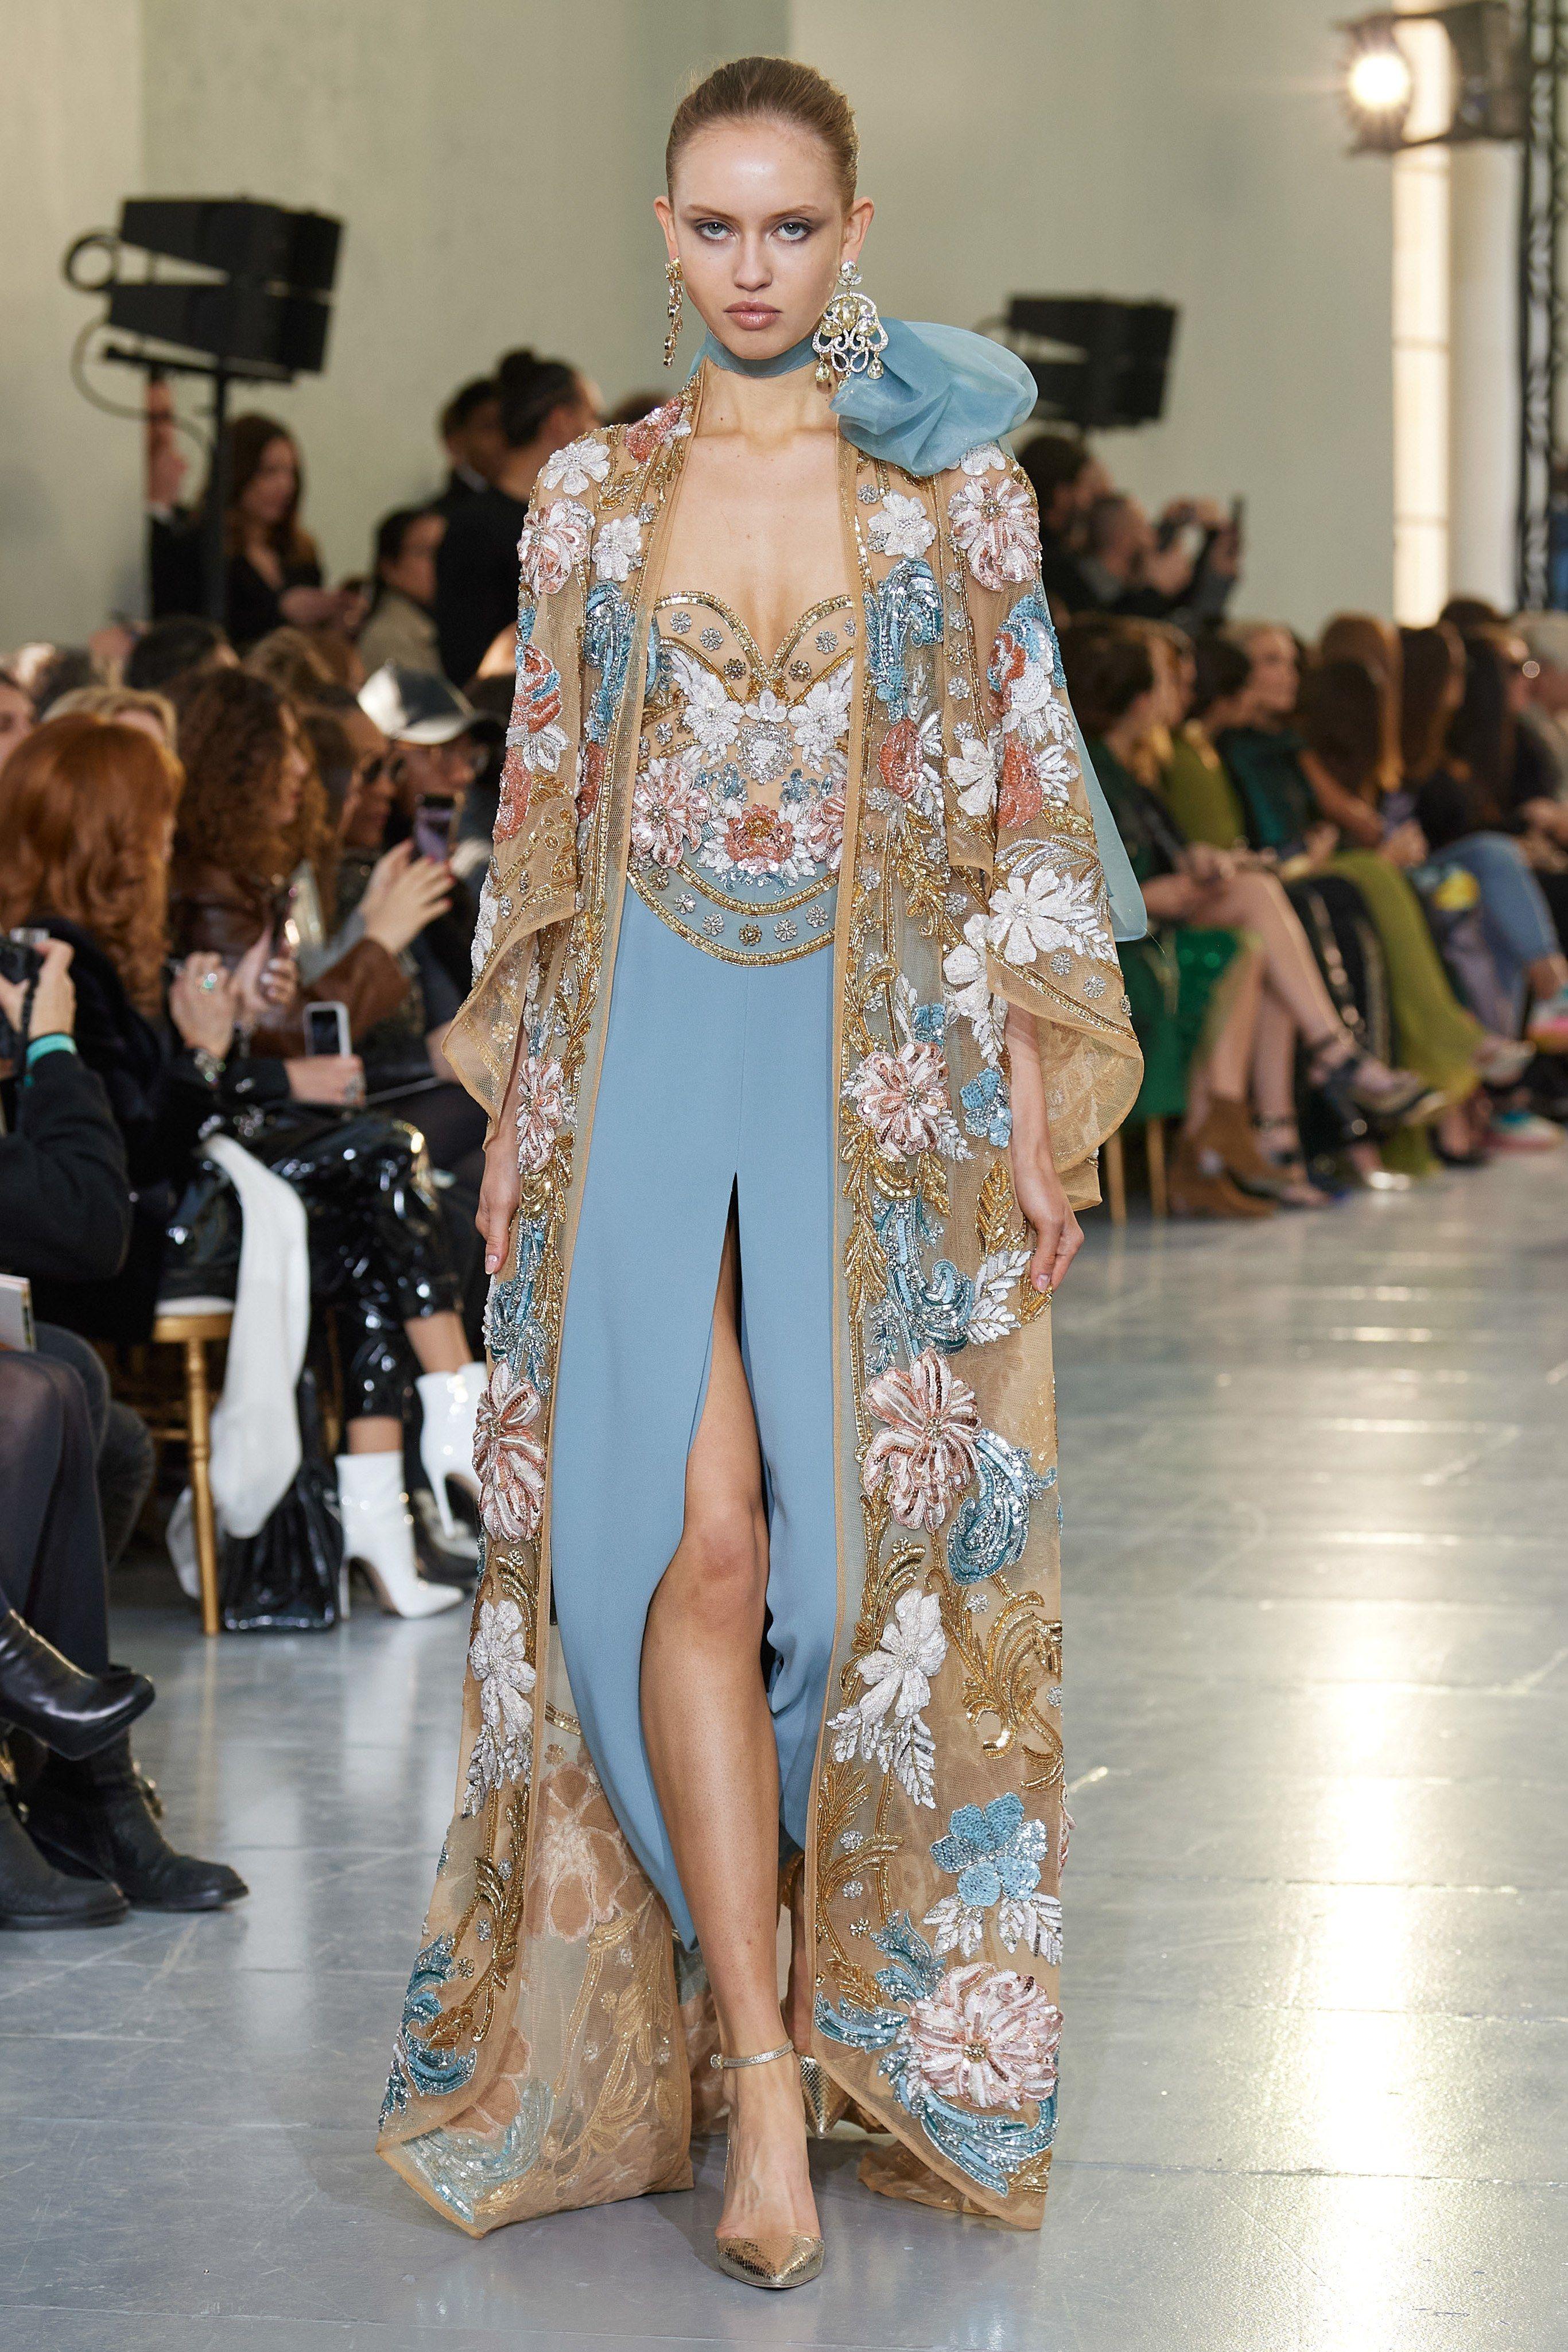 Elie Saab Spring 2020 Couture Collection Vogue Elie Saab Couture Couture Fashion Elie Saab Bridal